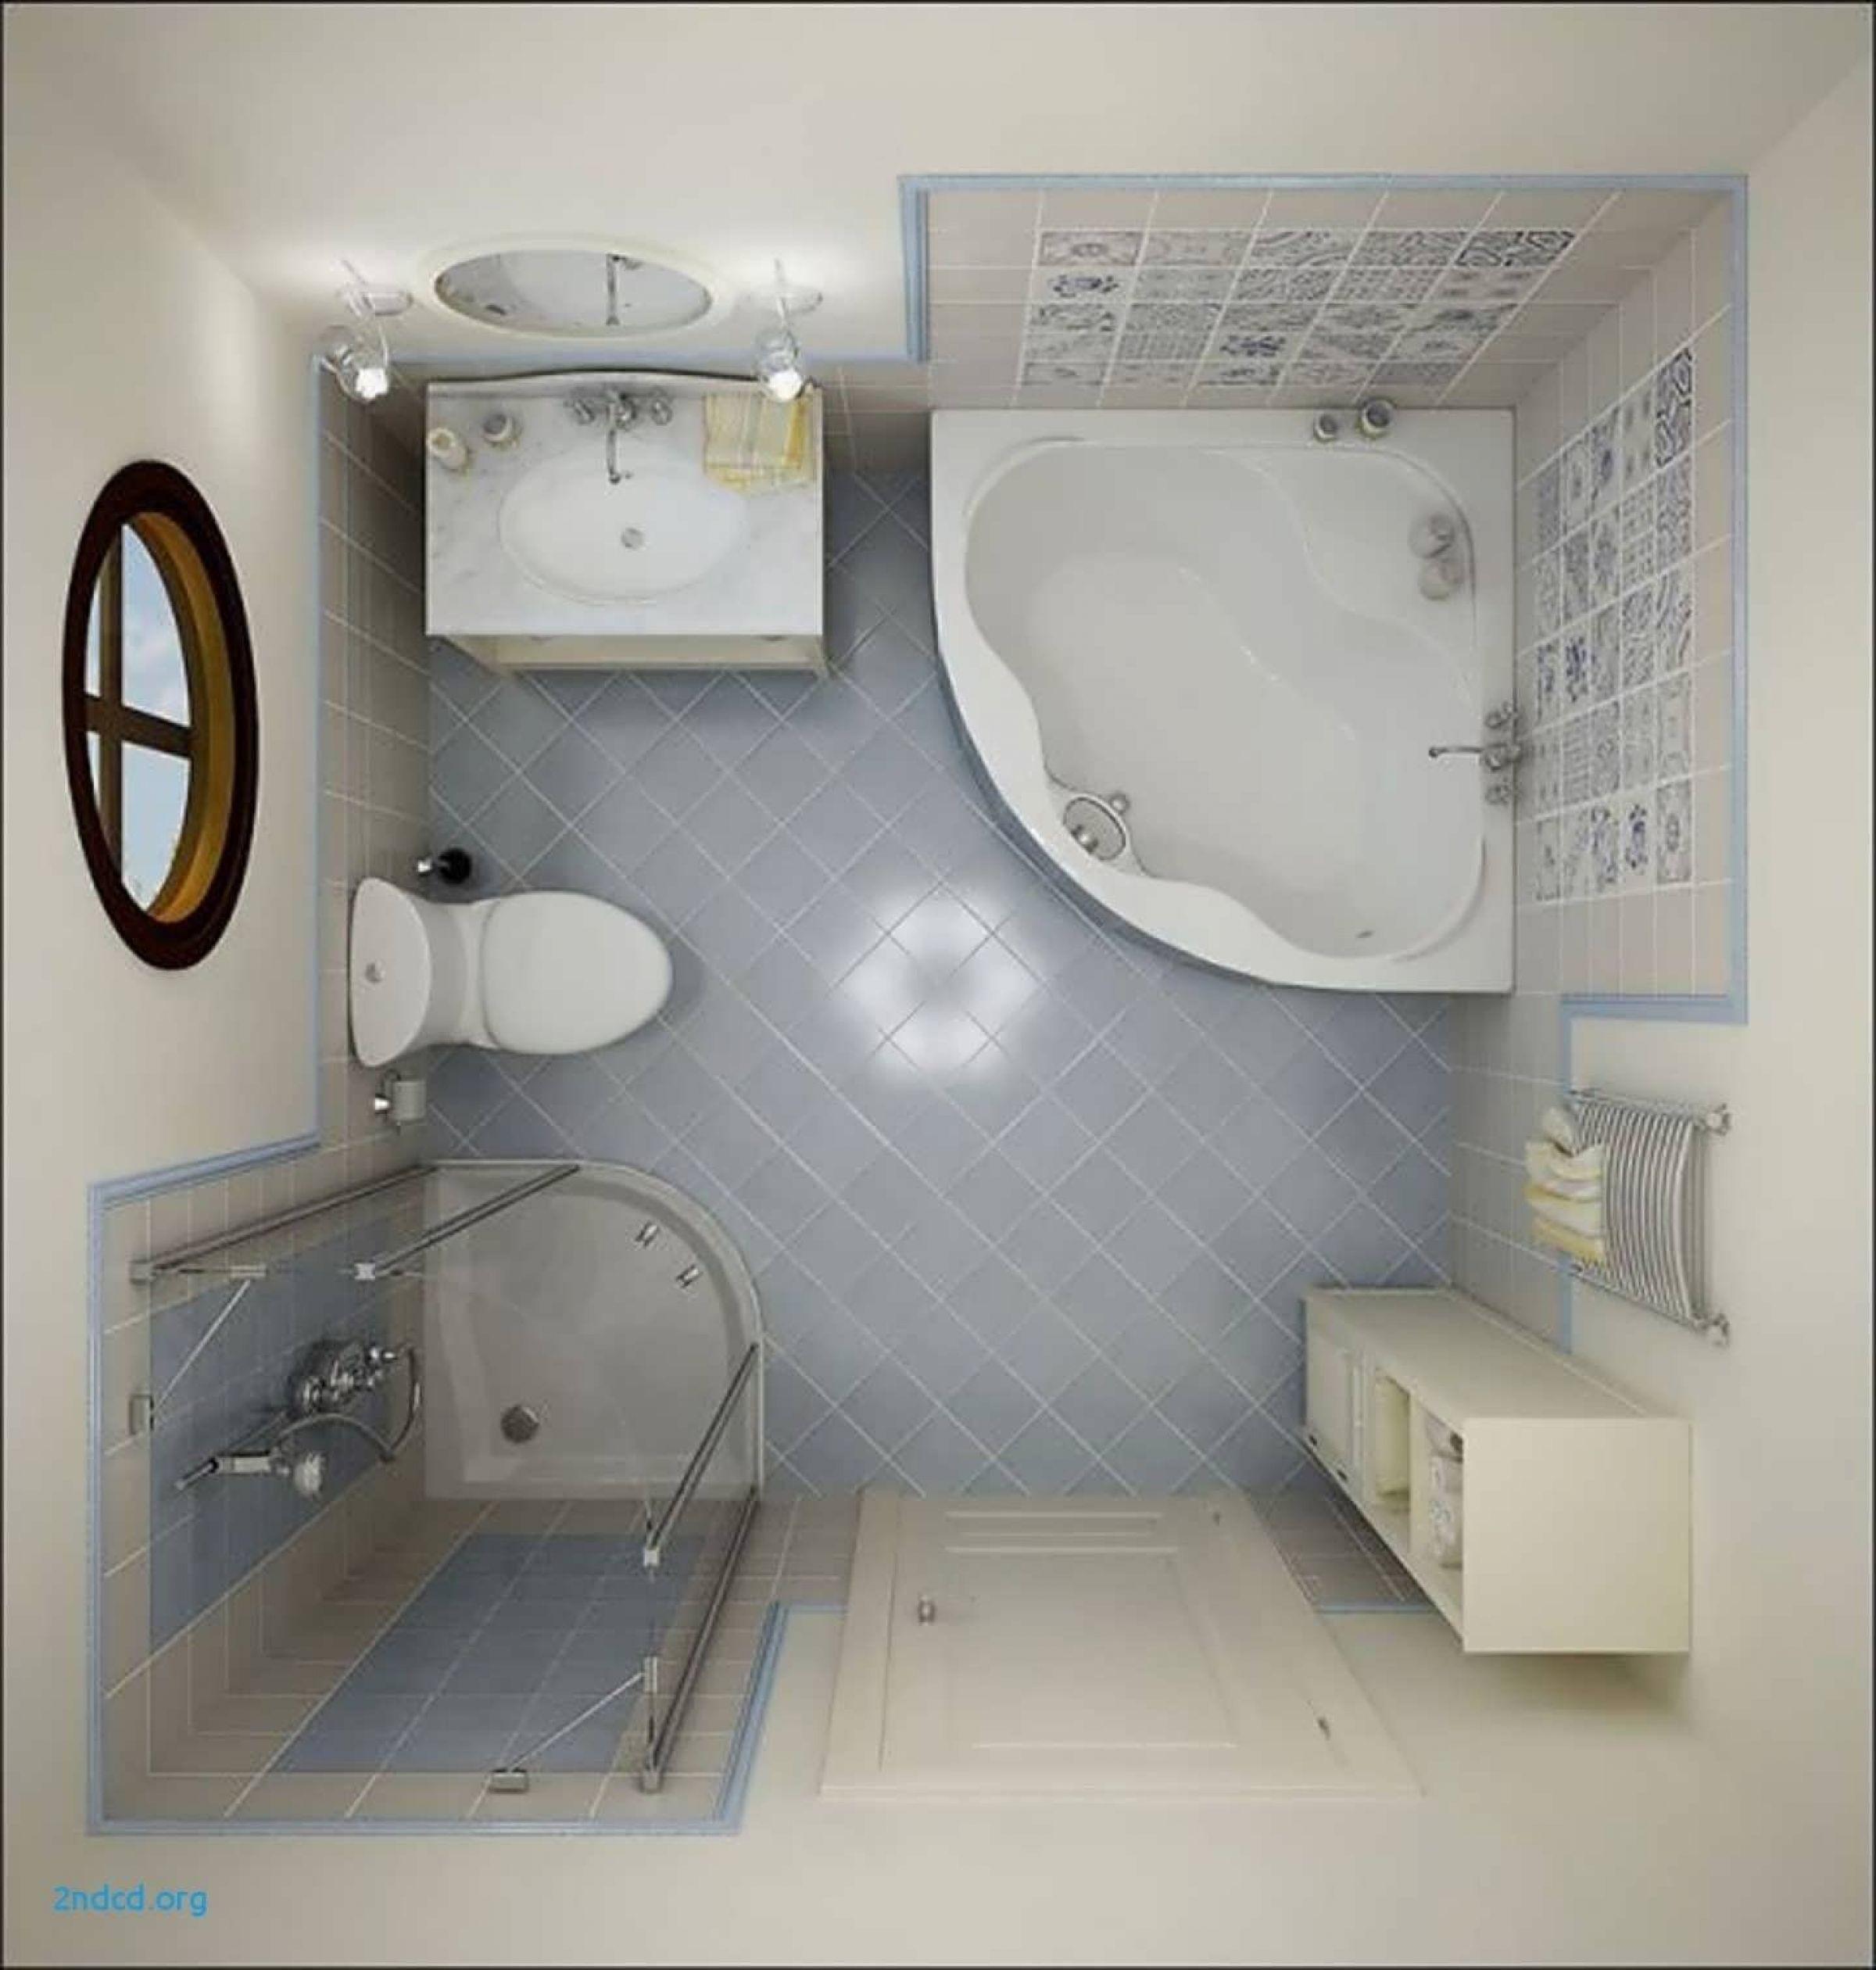 Corner Bathtub Shower How To Choose The Best Ideas On Foter Simple Bathroom Designs Bathroom Design Layout Compact Bathroom Design Simple bathroom size tub